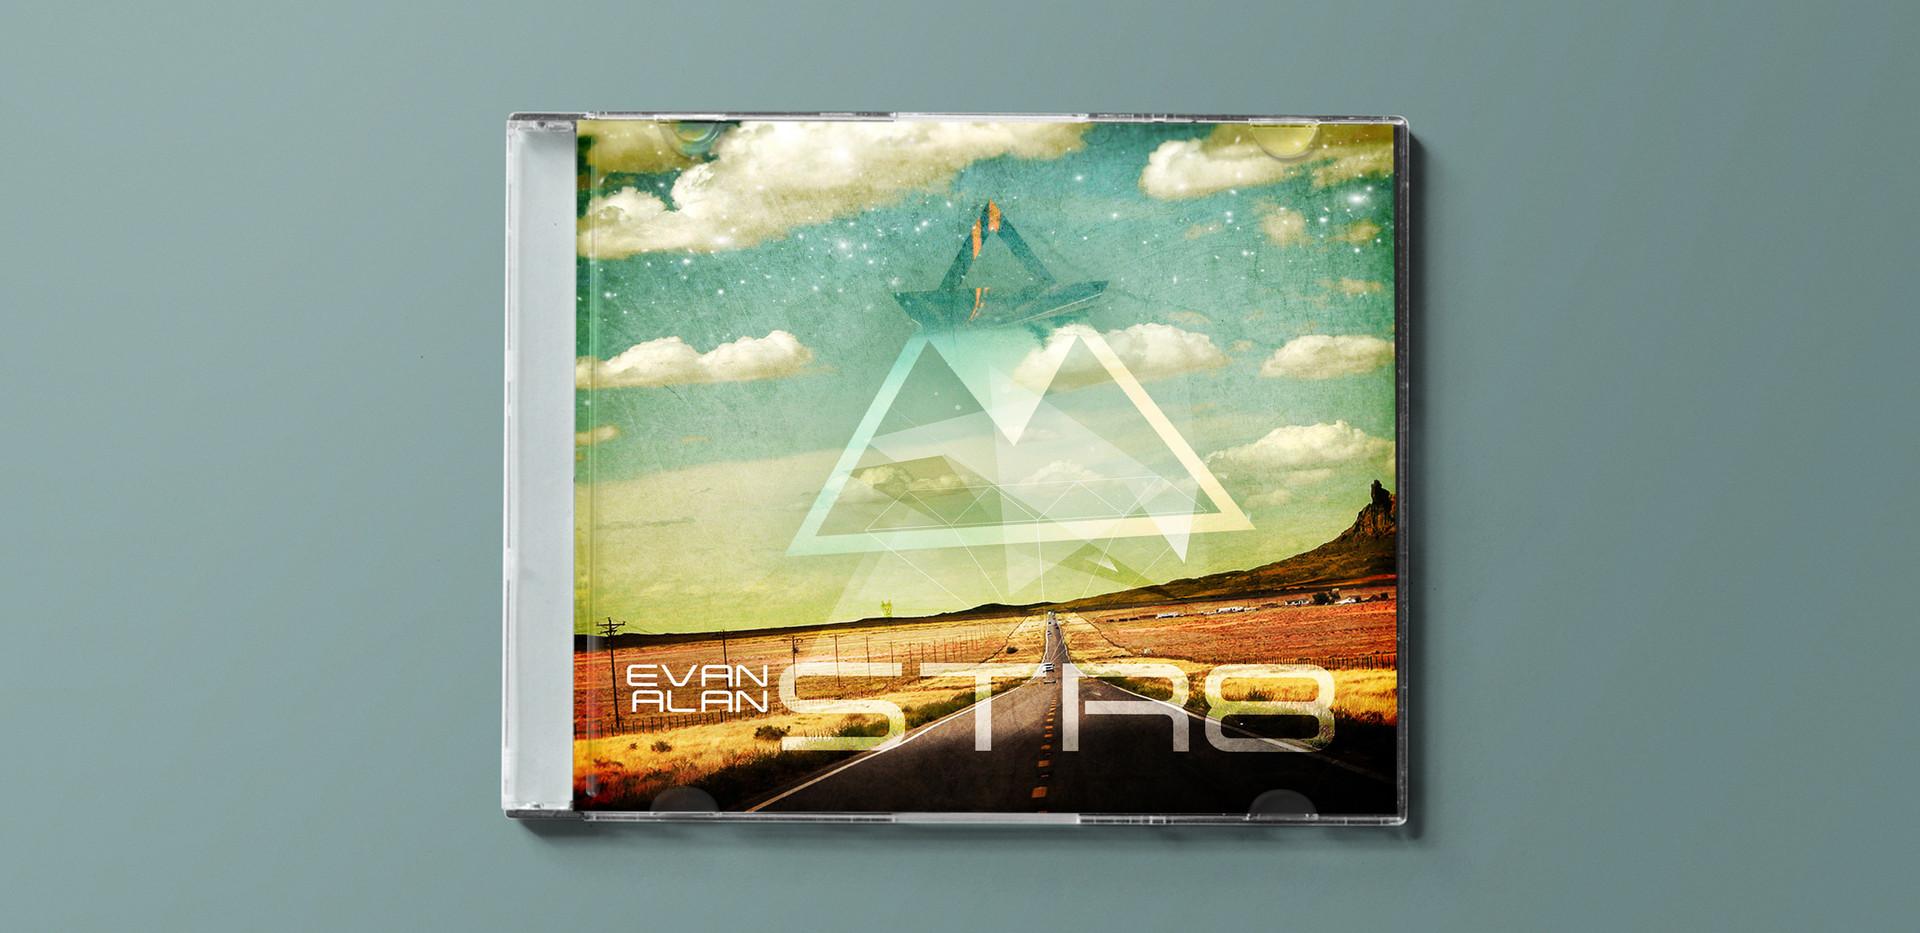 STR8 CD Cover